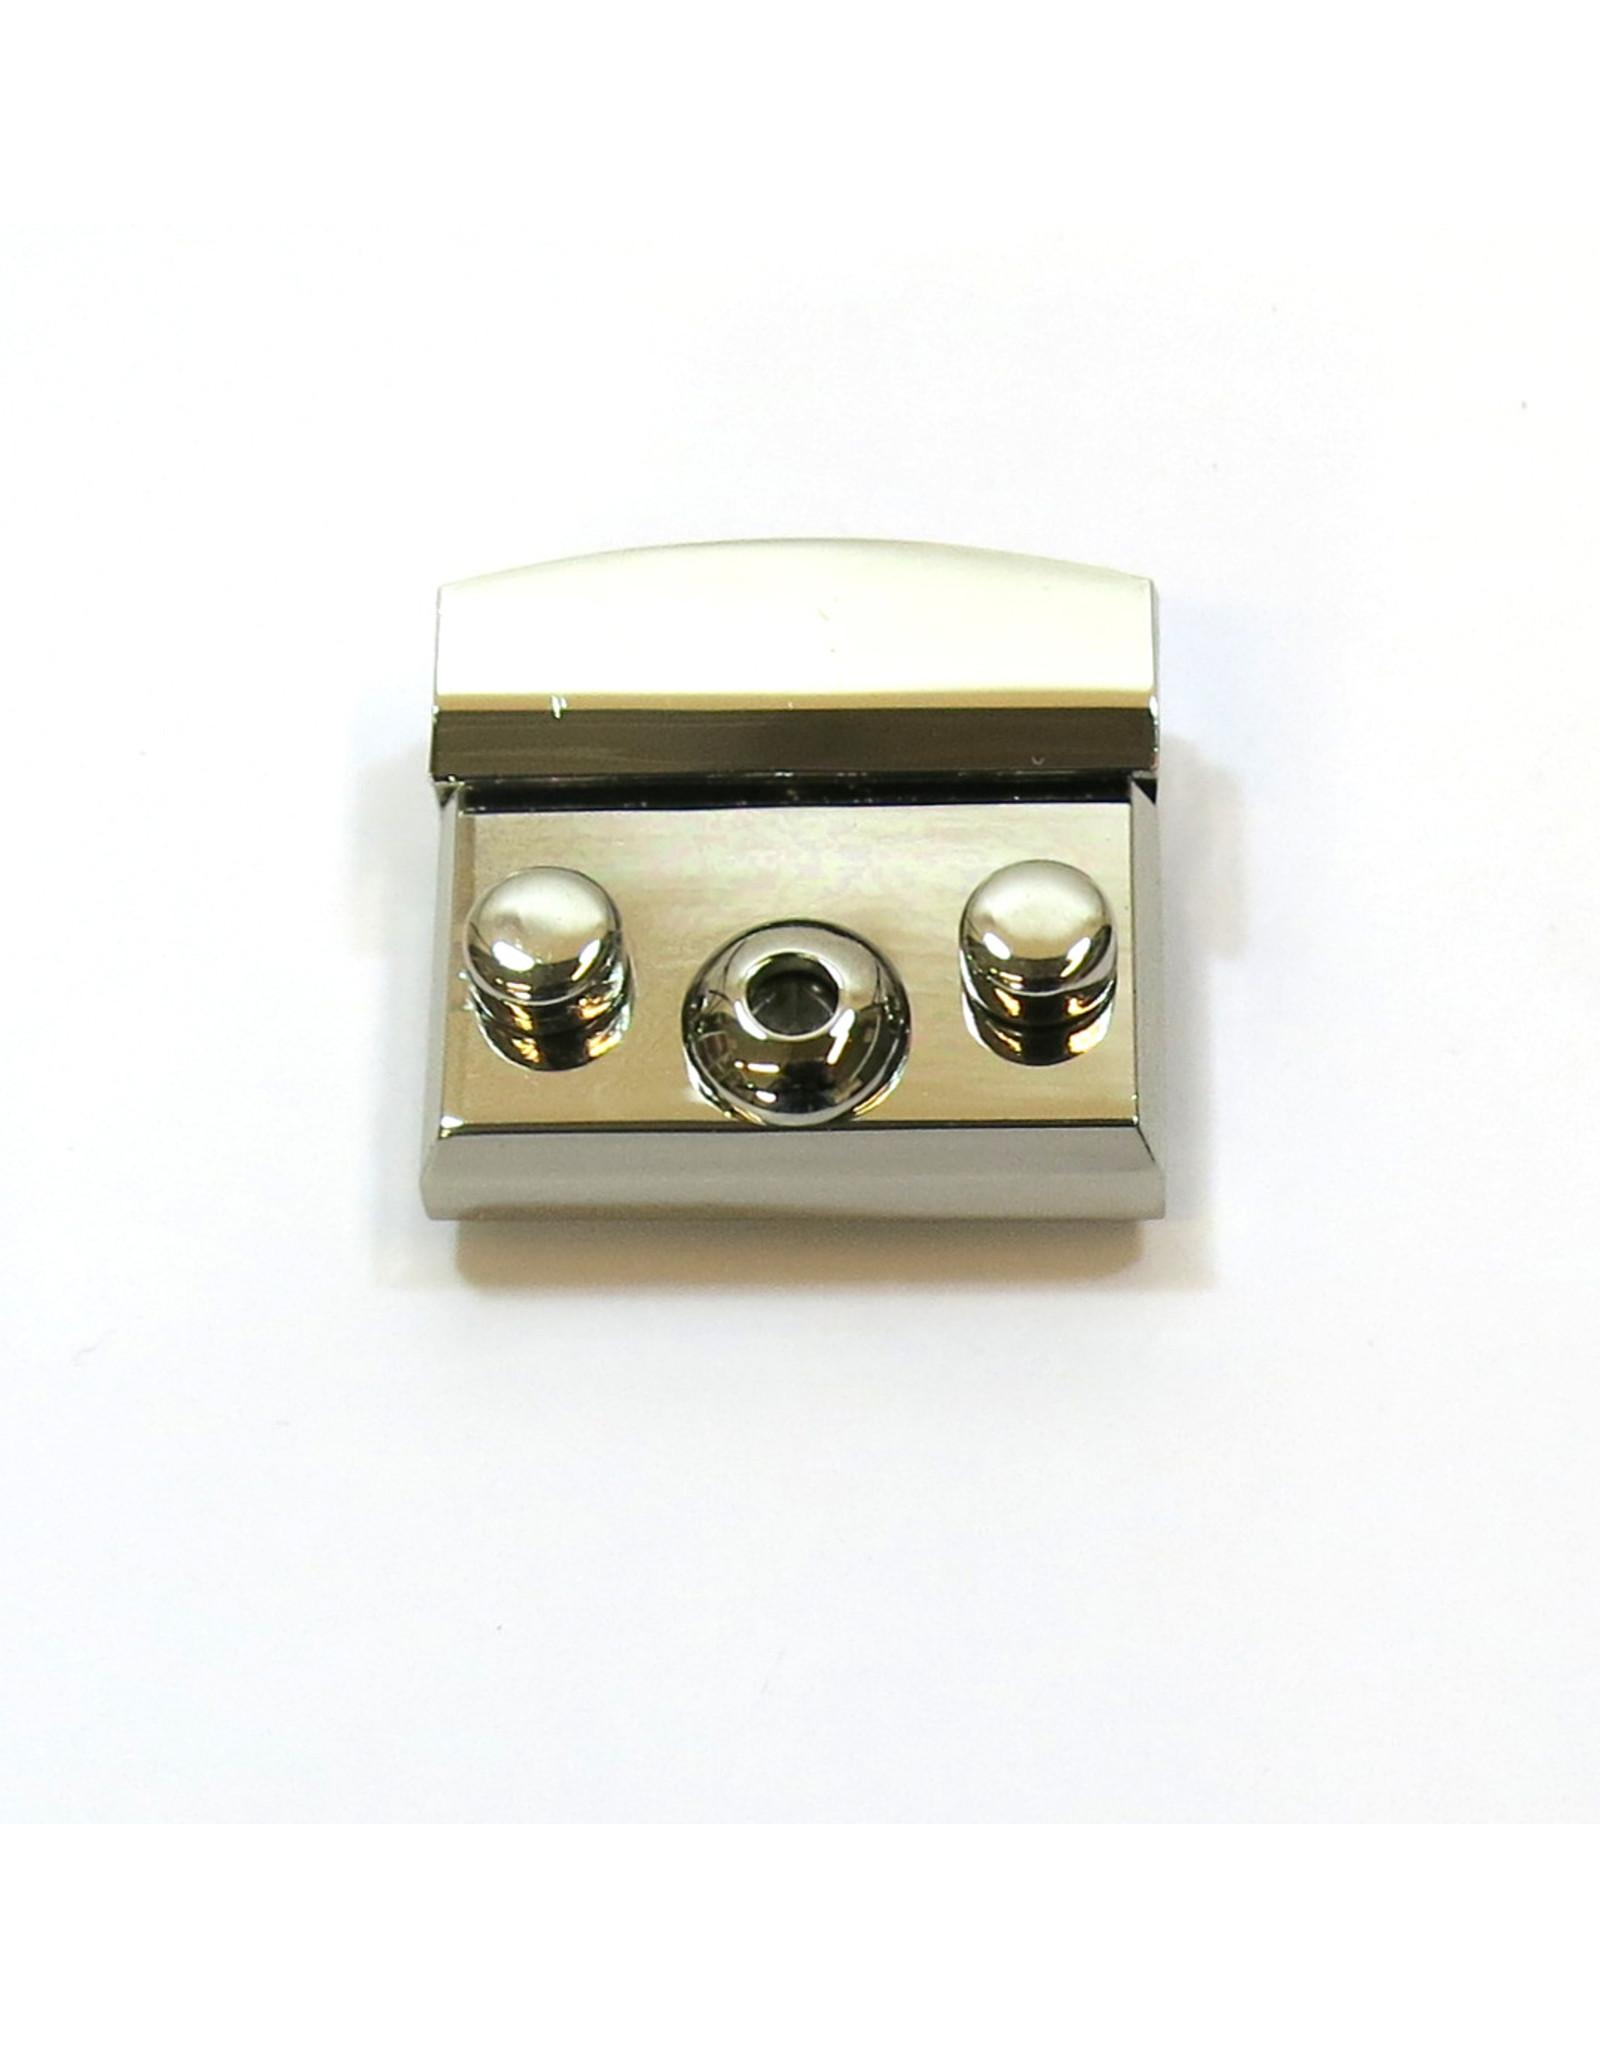 Purse/bag lock (with key lock)